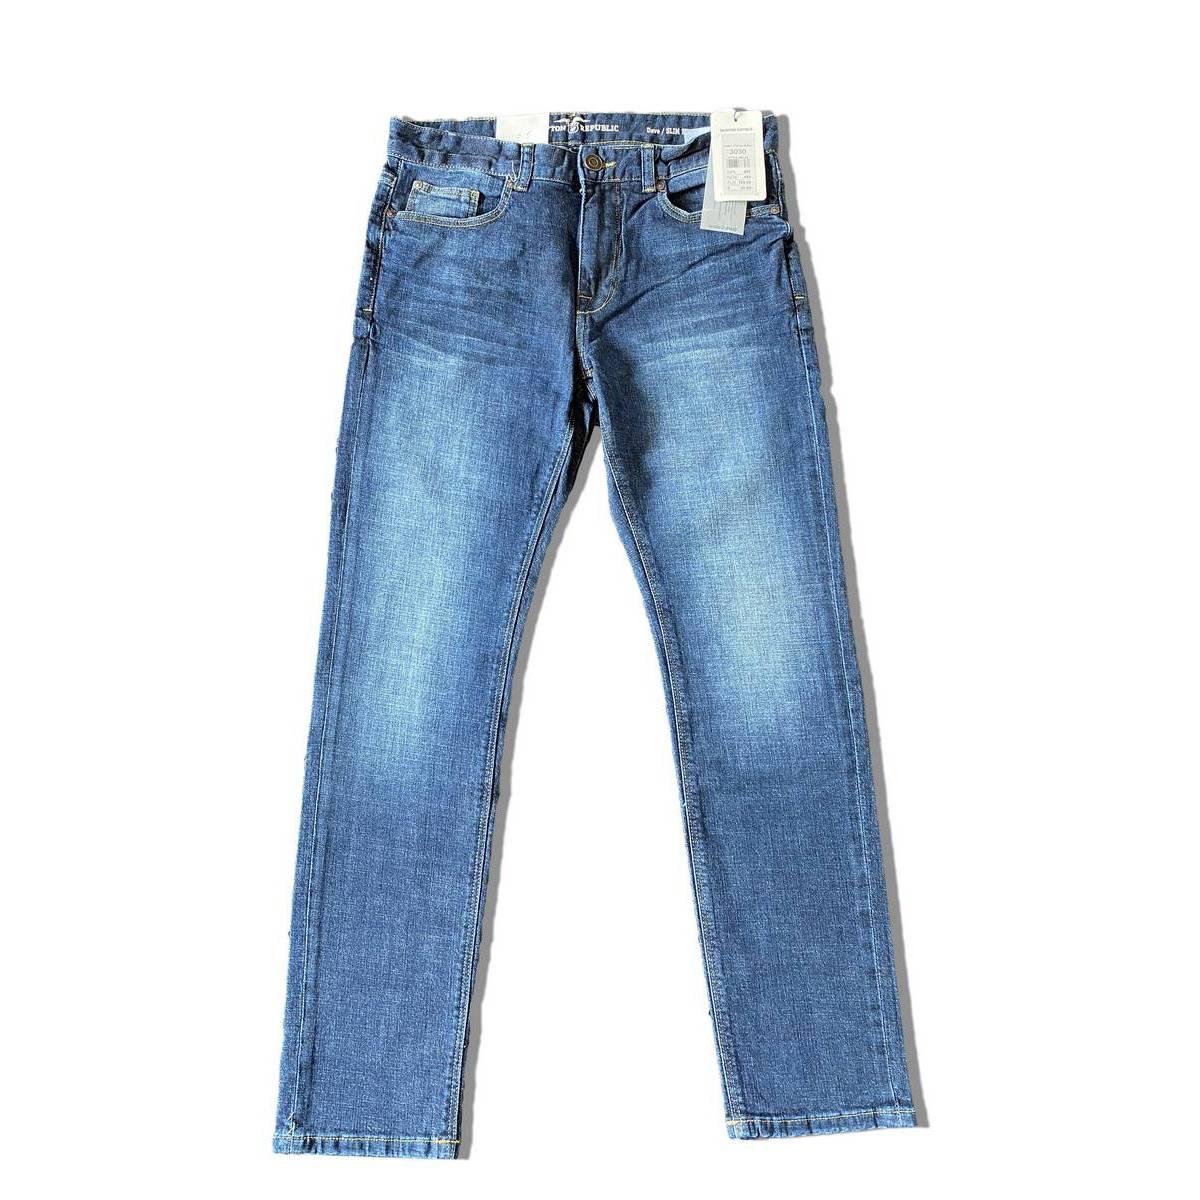 KPL Hampton Republic Branded Premium Quality Slim Fit Denim Jeans for Men